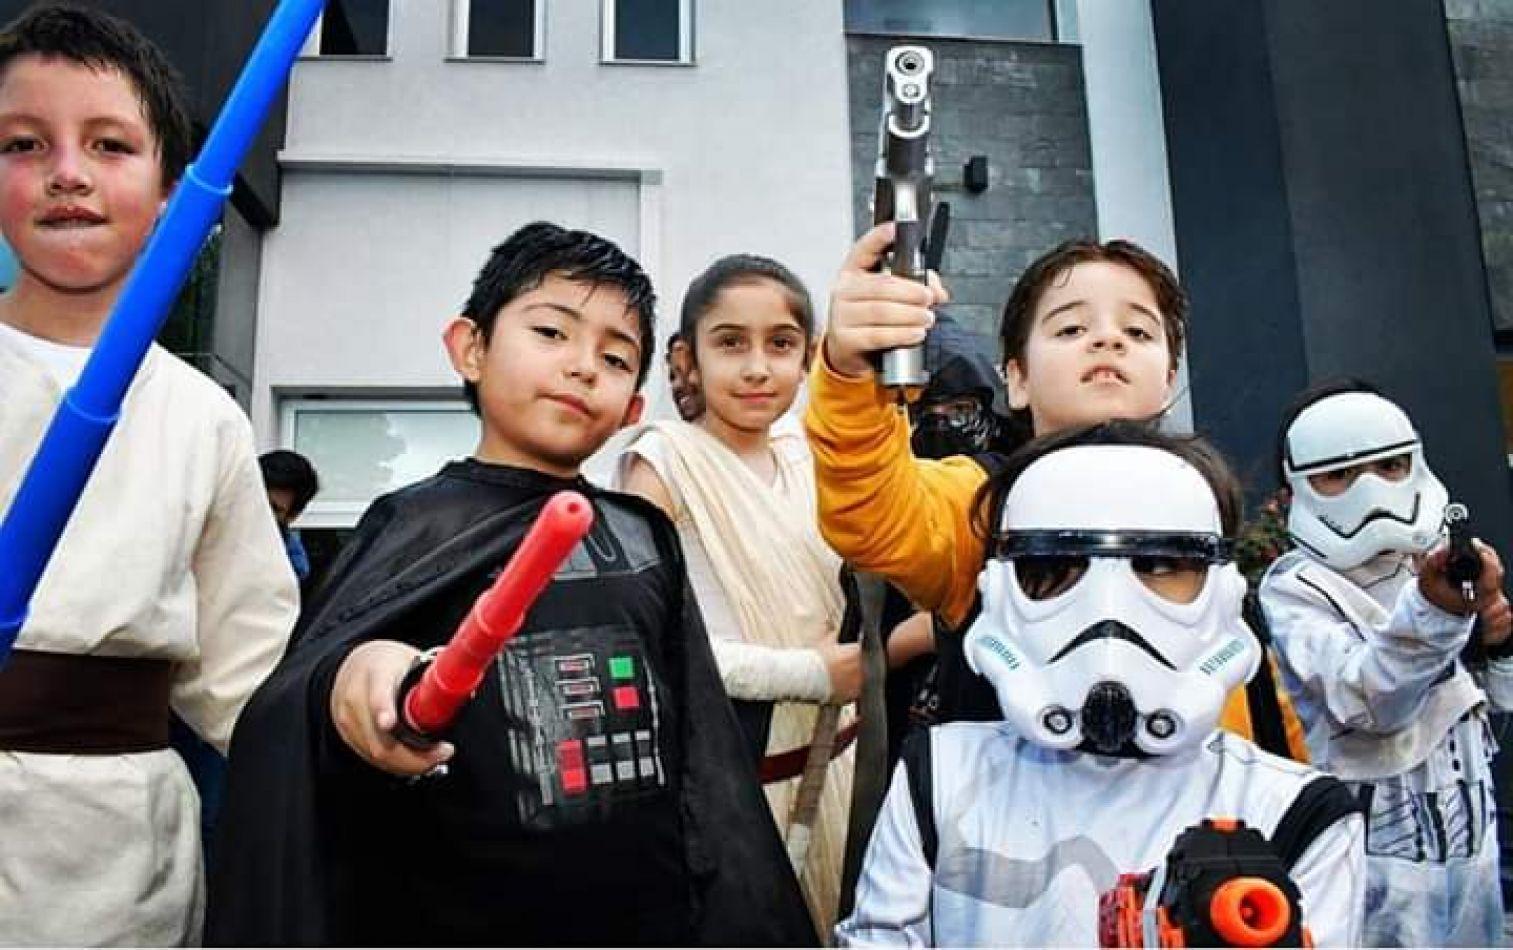 Para fans de Star Wars